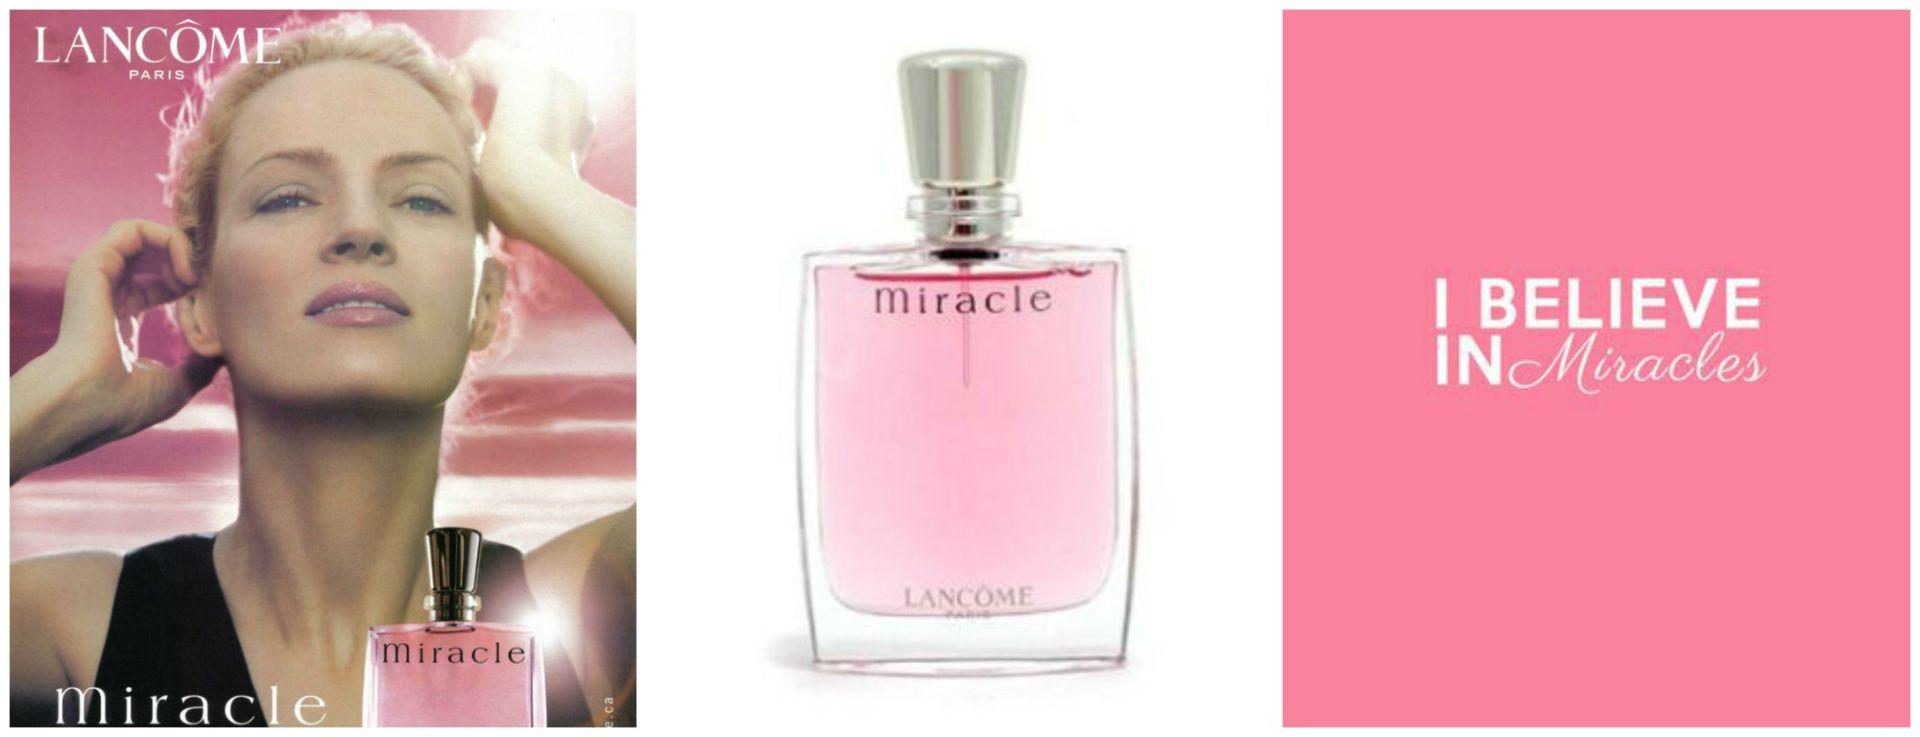 lancome miracle perfume